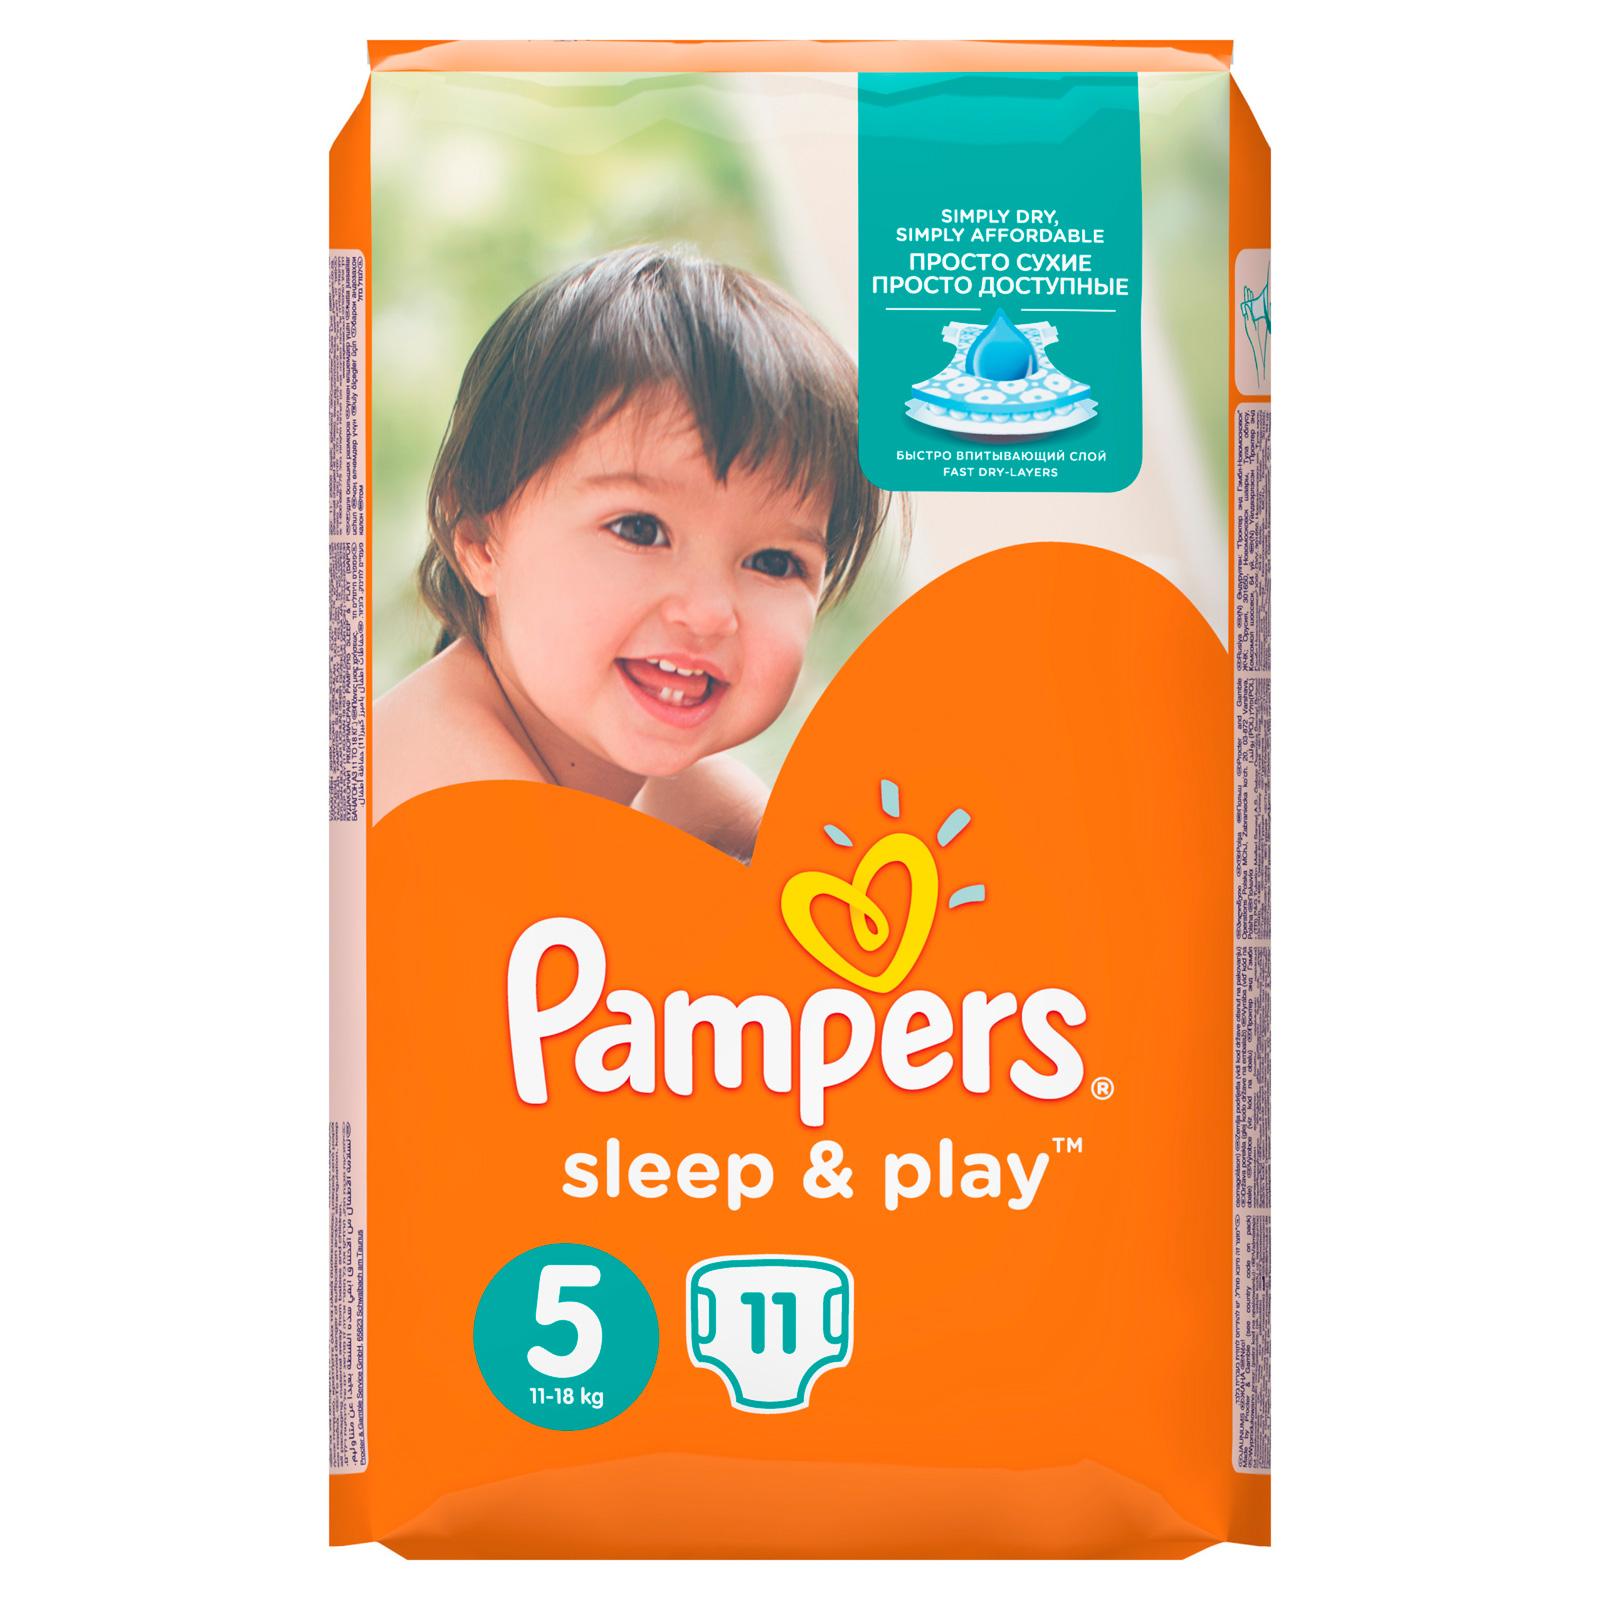 Подгузники Pampers Sleep&amp;amp;Play Junior 11-18 кг (11 шт) Размер 5<br>